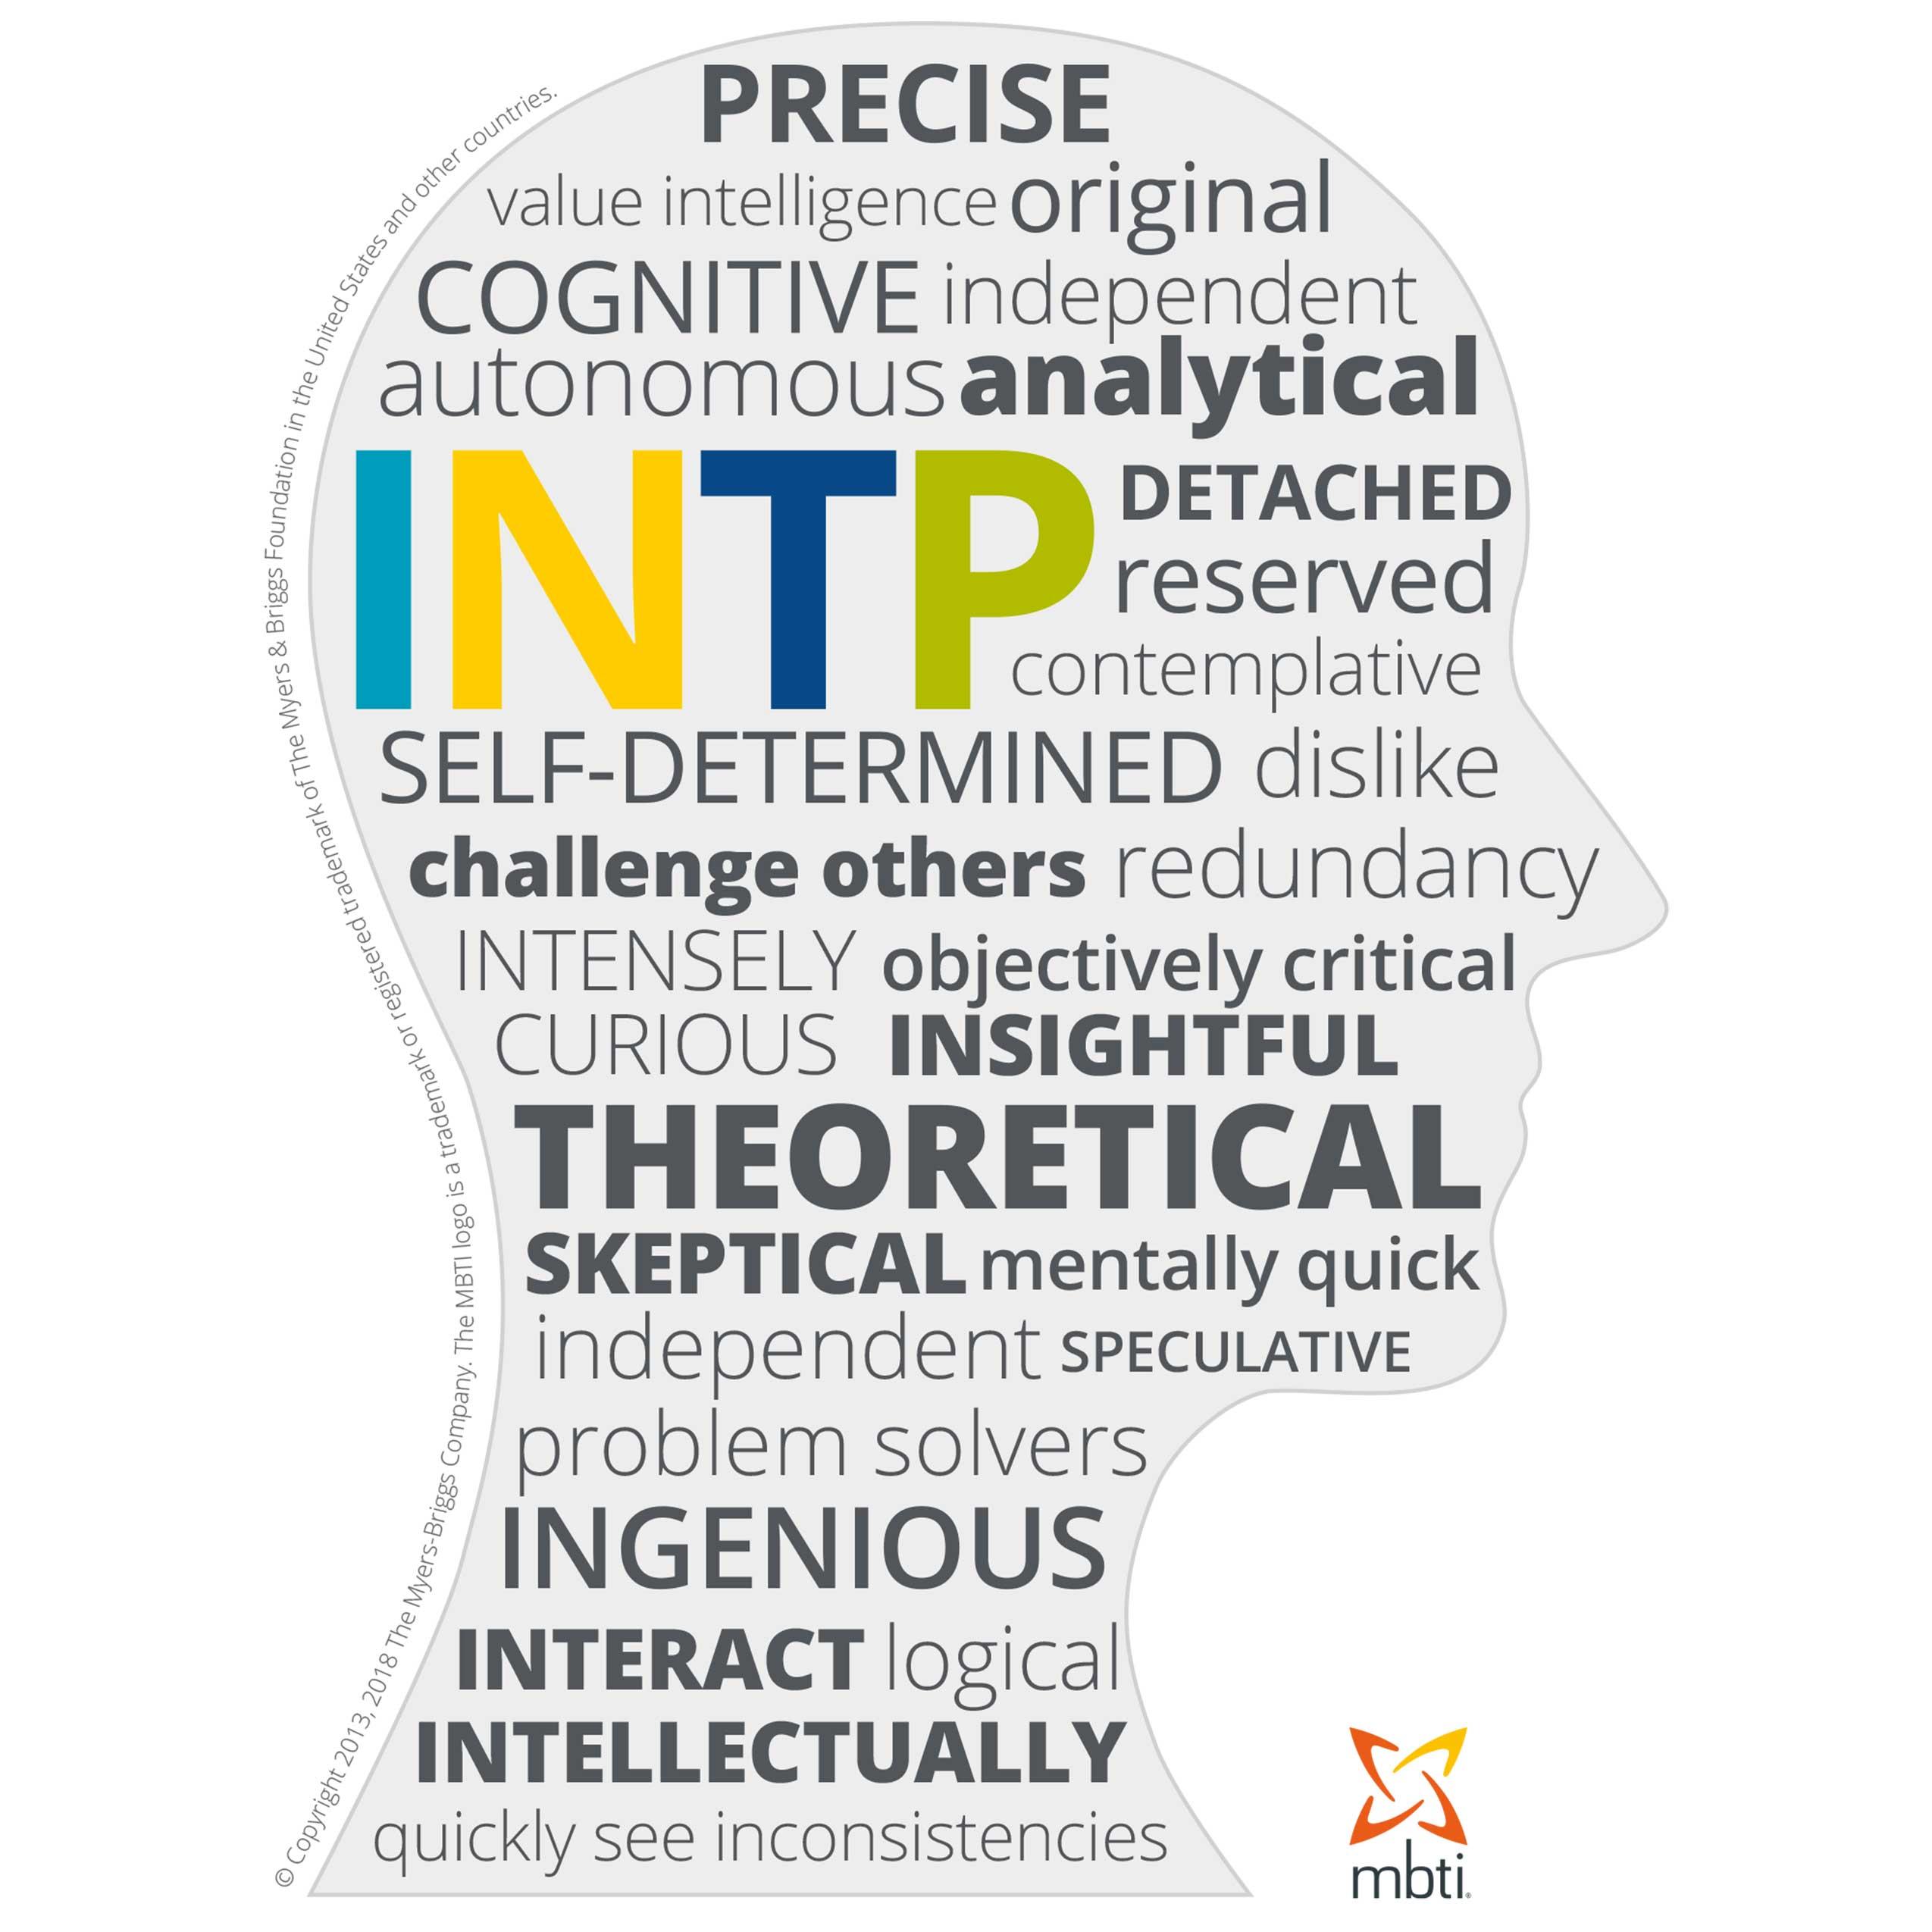 MBTI Myers-Briggs Personality Type Characteristics INTP